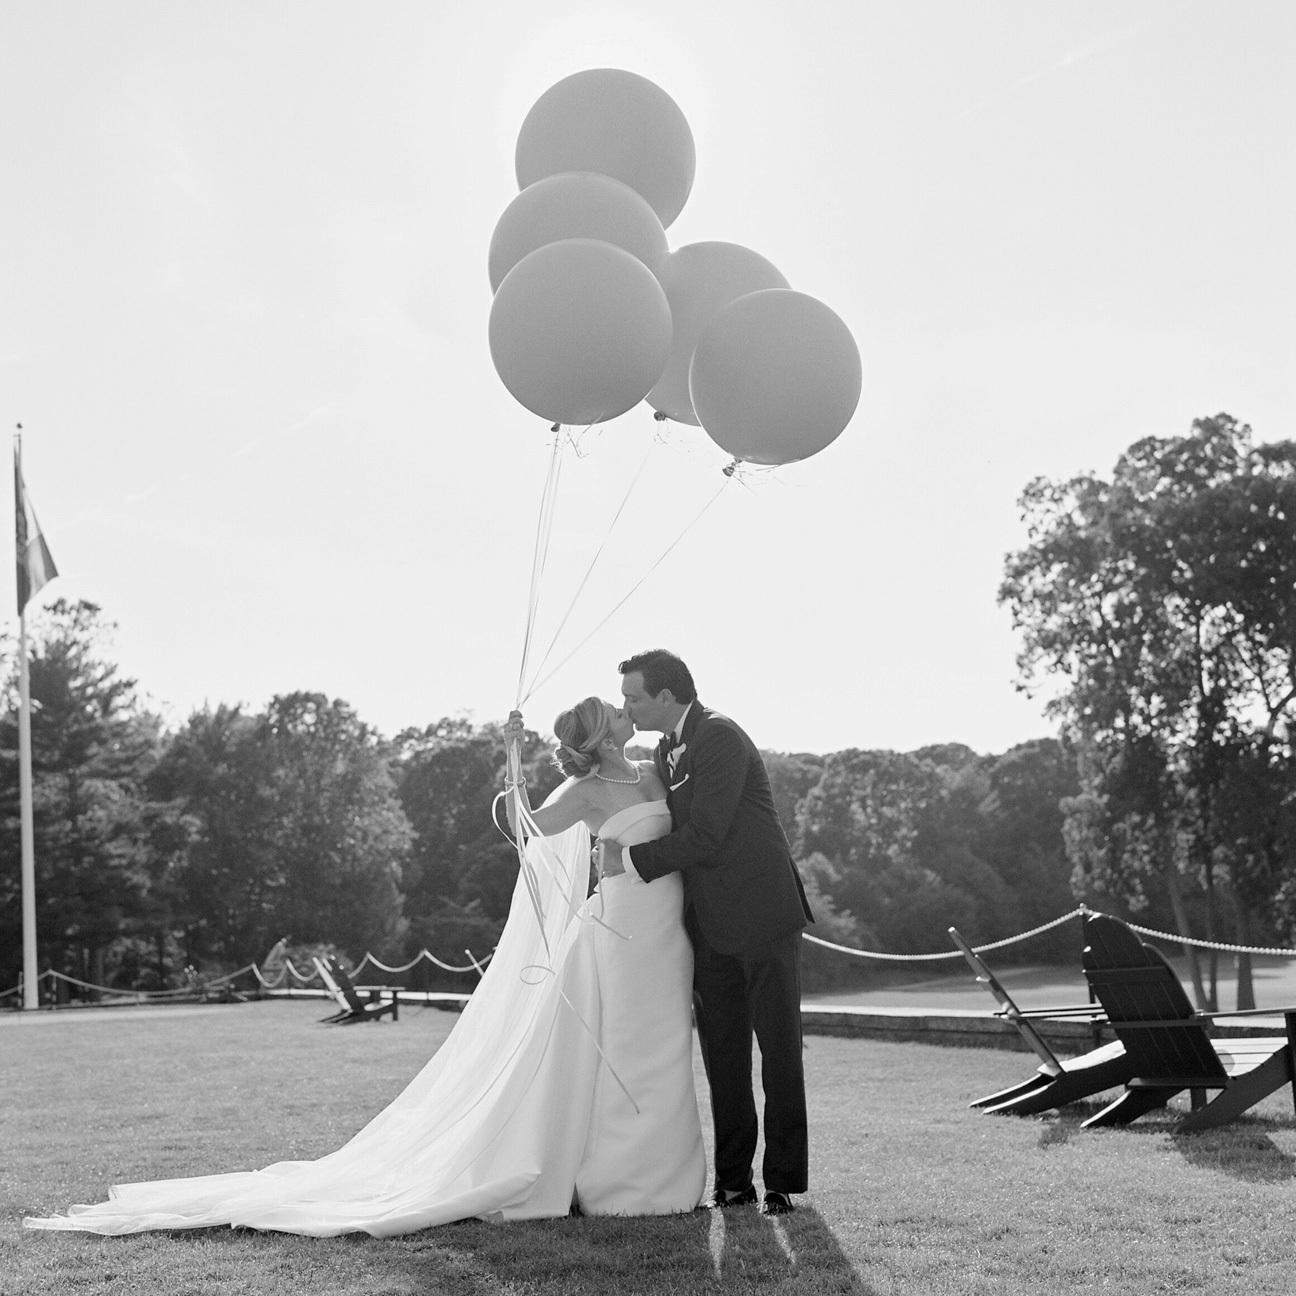 Wedding couple kissing holding balloons